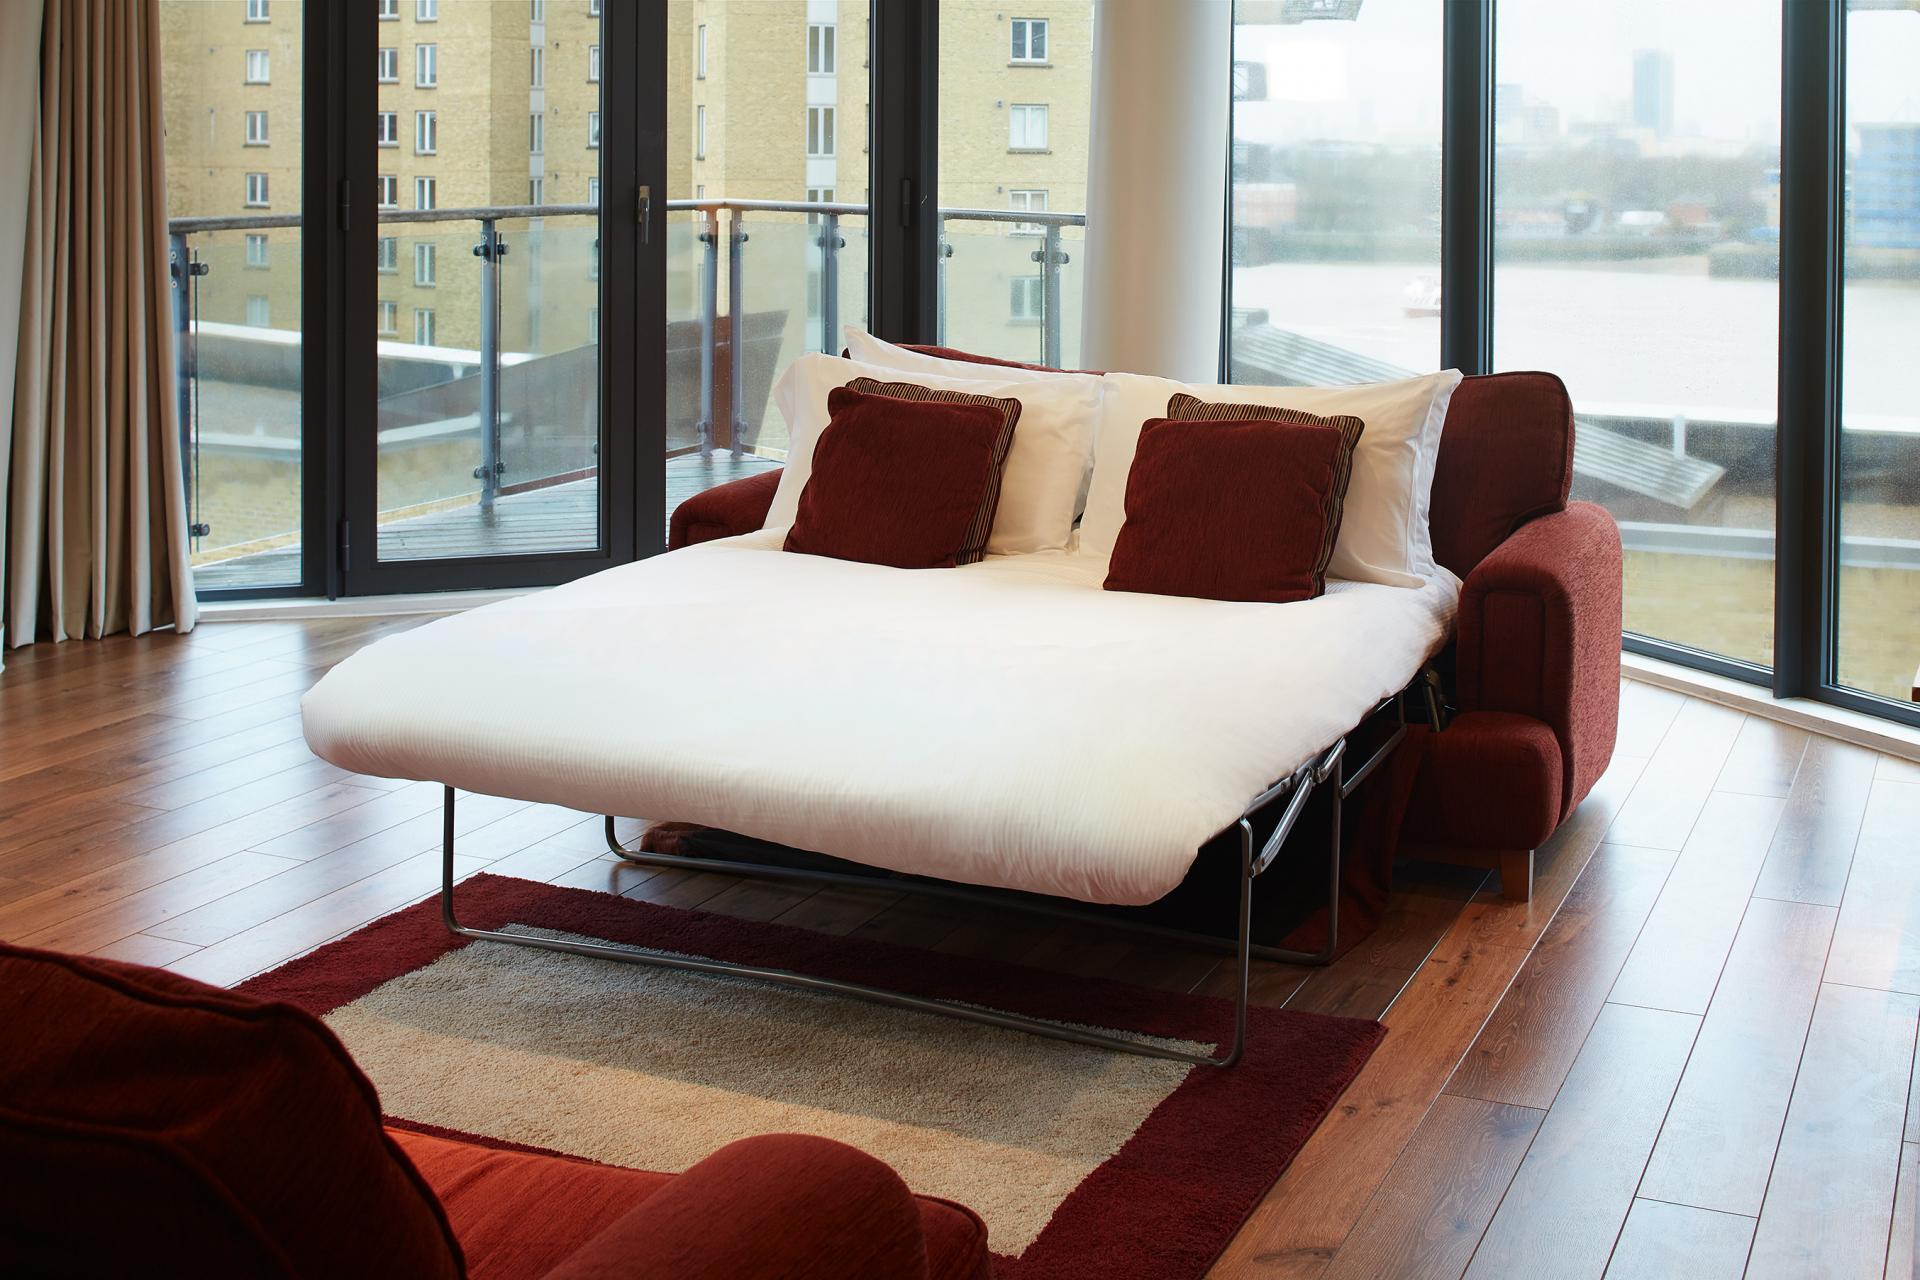 Sofa bed at Marlin Canary Wharf Apartments, Canary Wharf, London